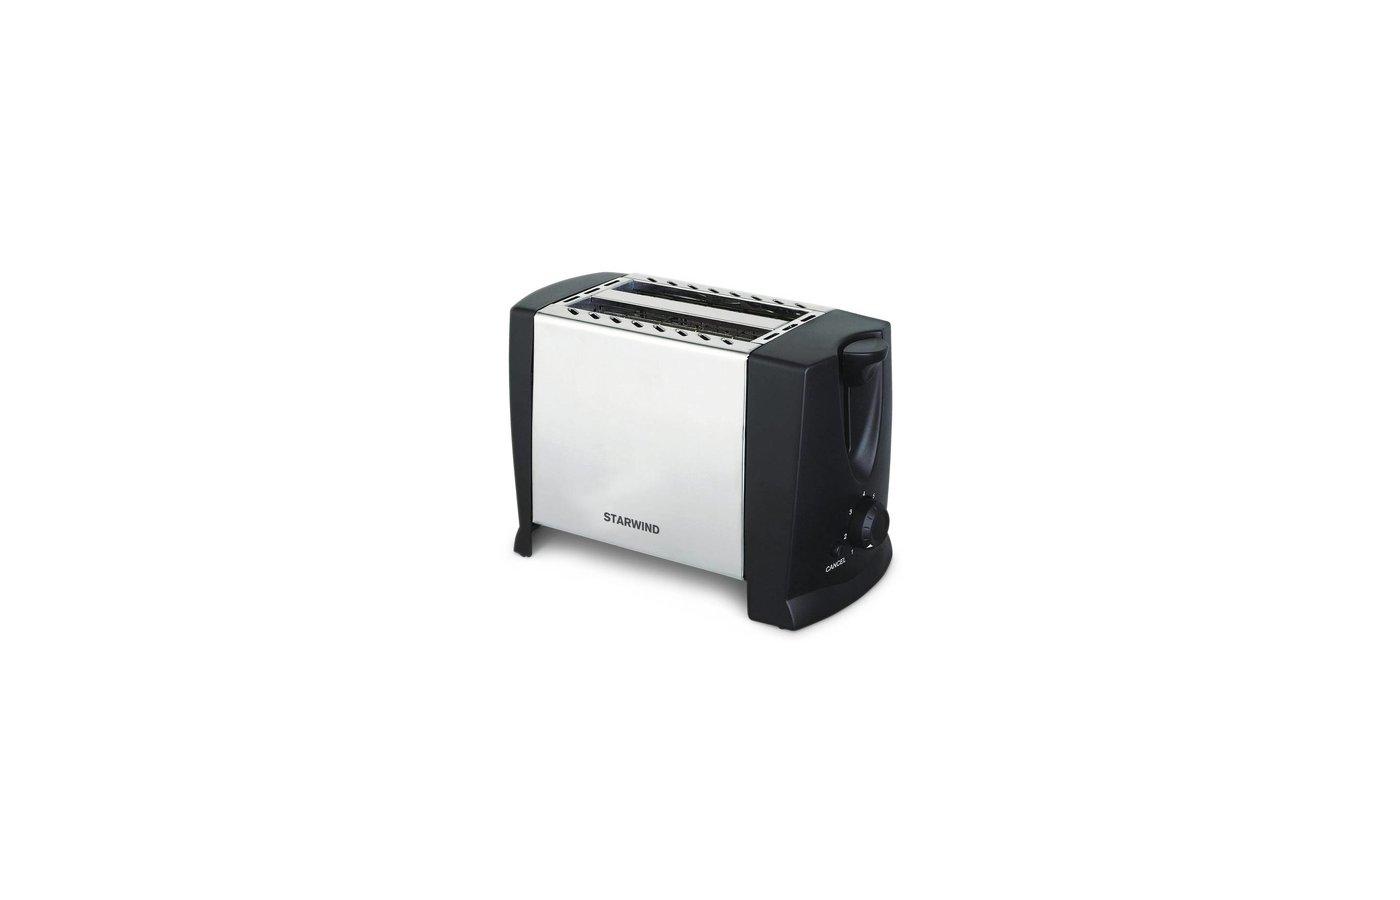 Тостер StarWind SET 1576 черный/серебристый